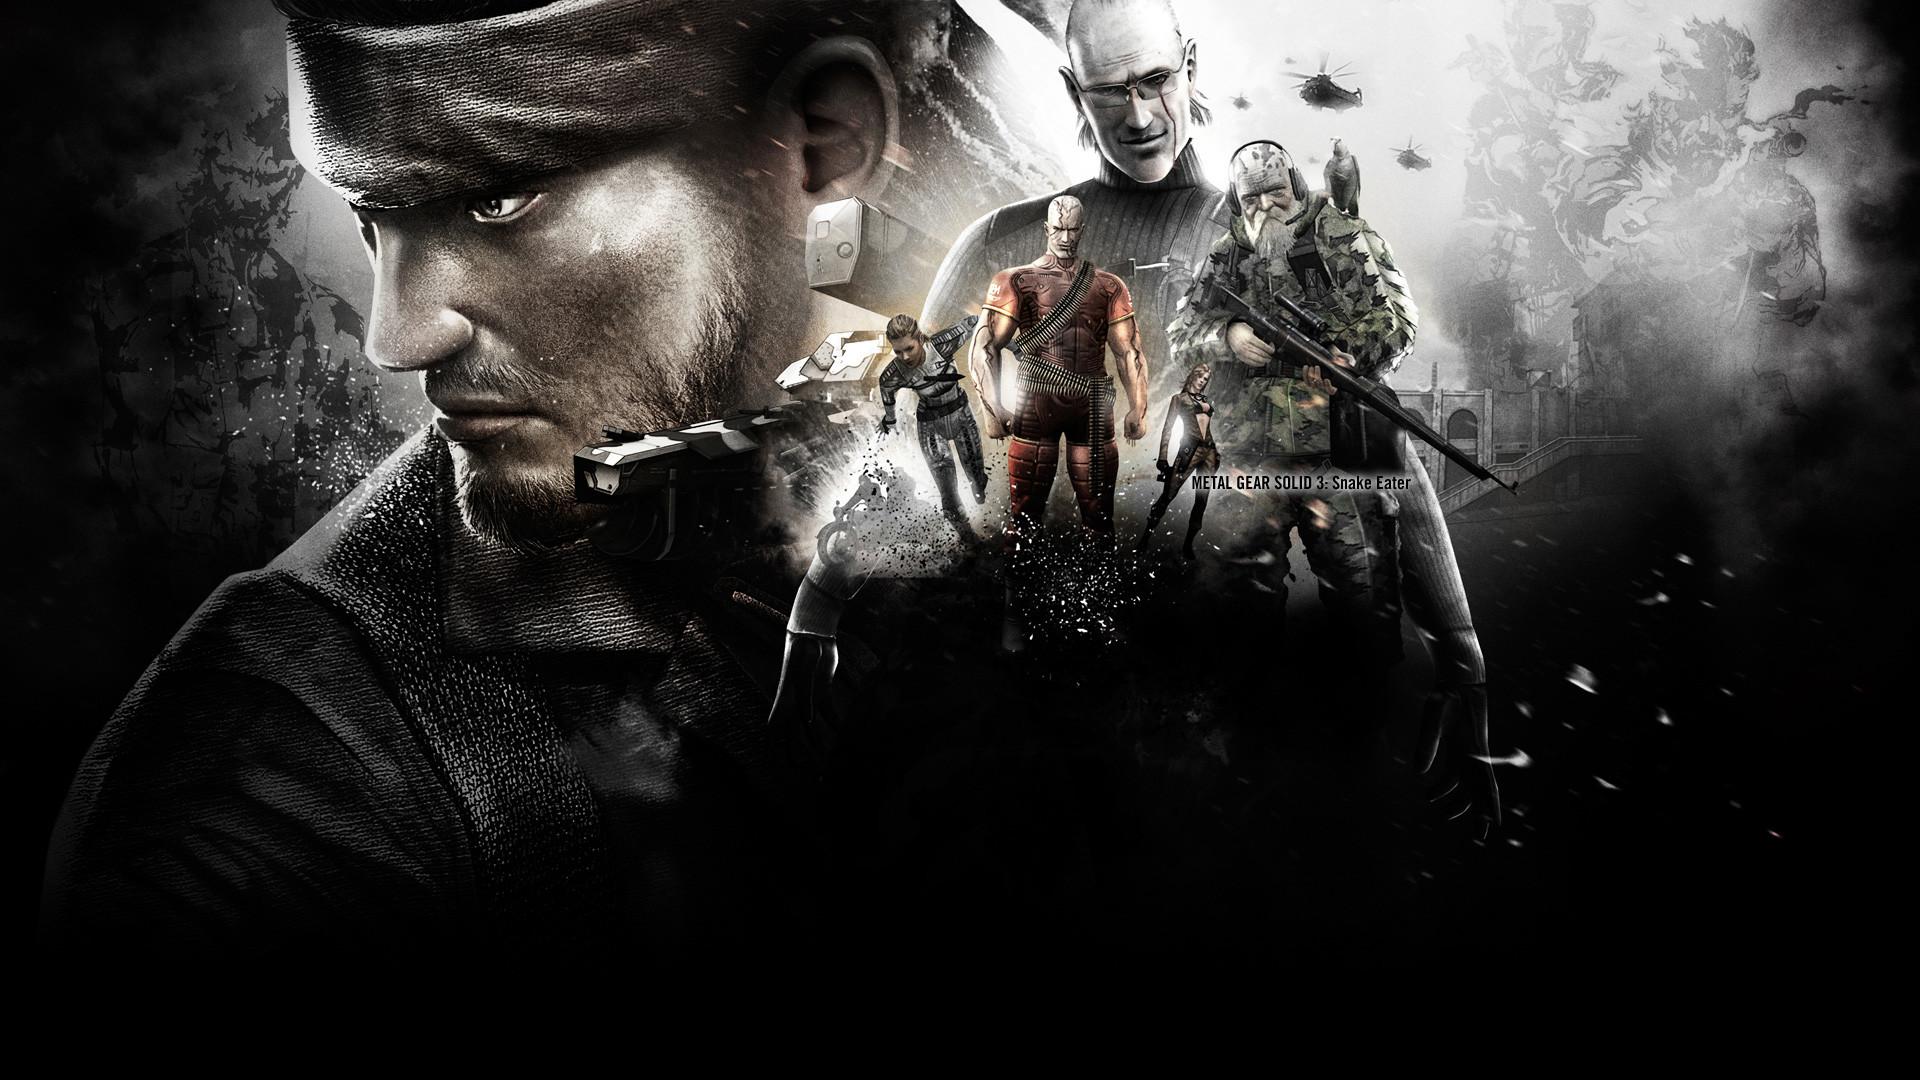 Metal Gear Solid Wallpapers Metal Gear Solid Desktop Wallpapers   HD  Wallpapers   Pinterest   Metal gear solid, Metal gear and Wallpaper